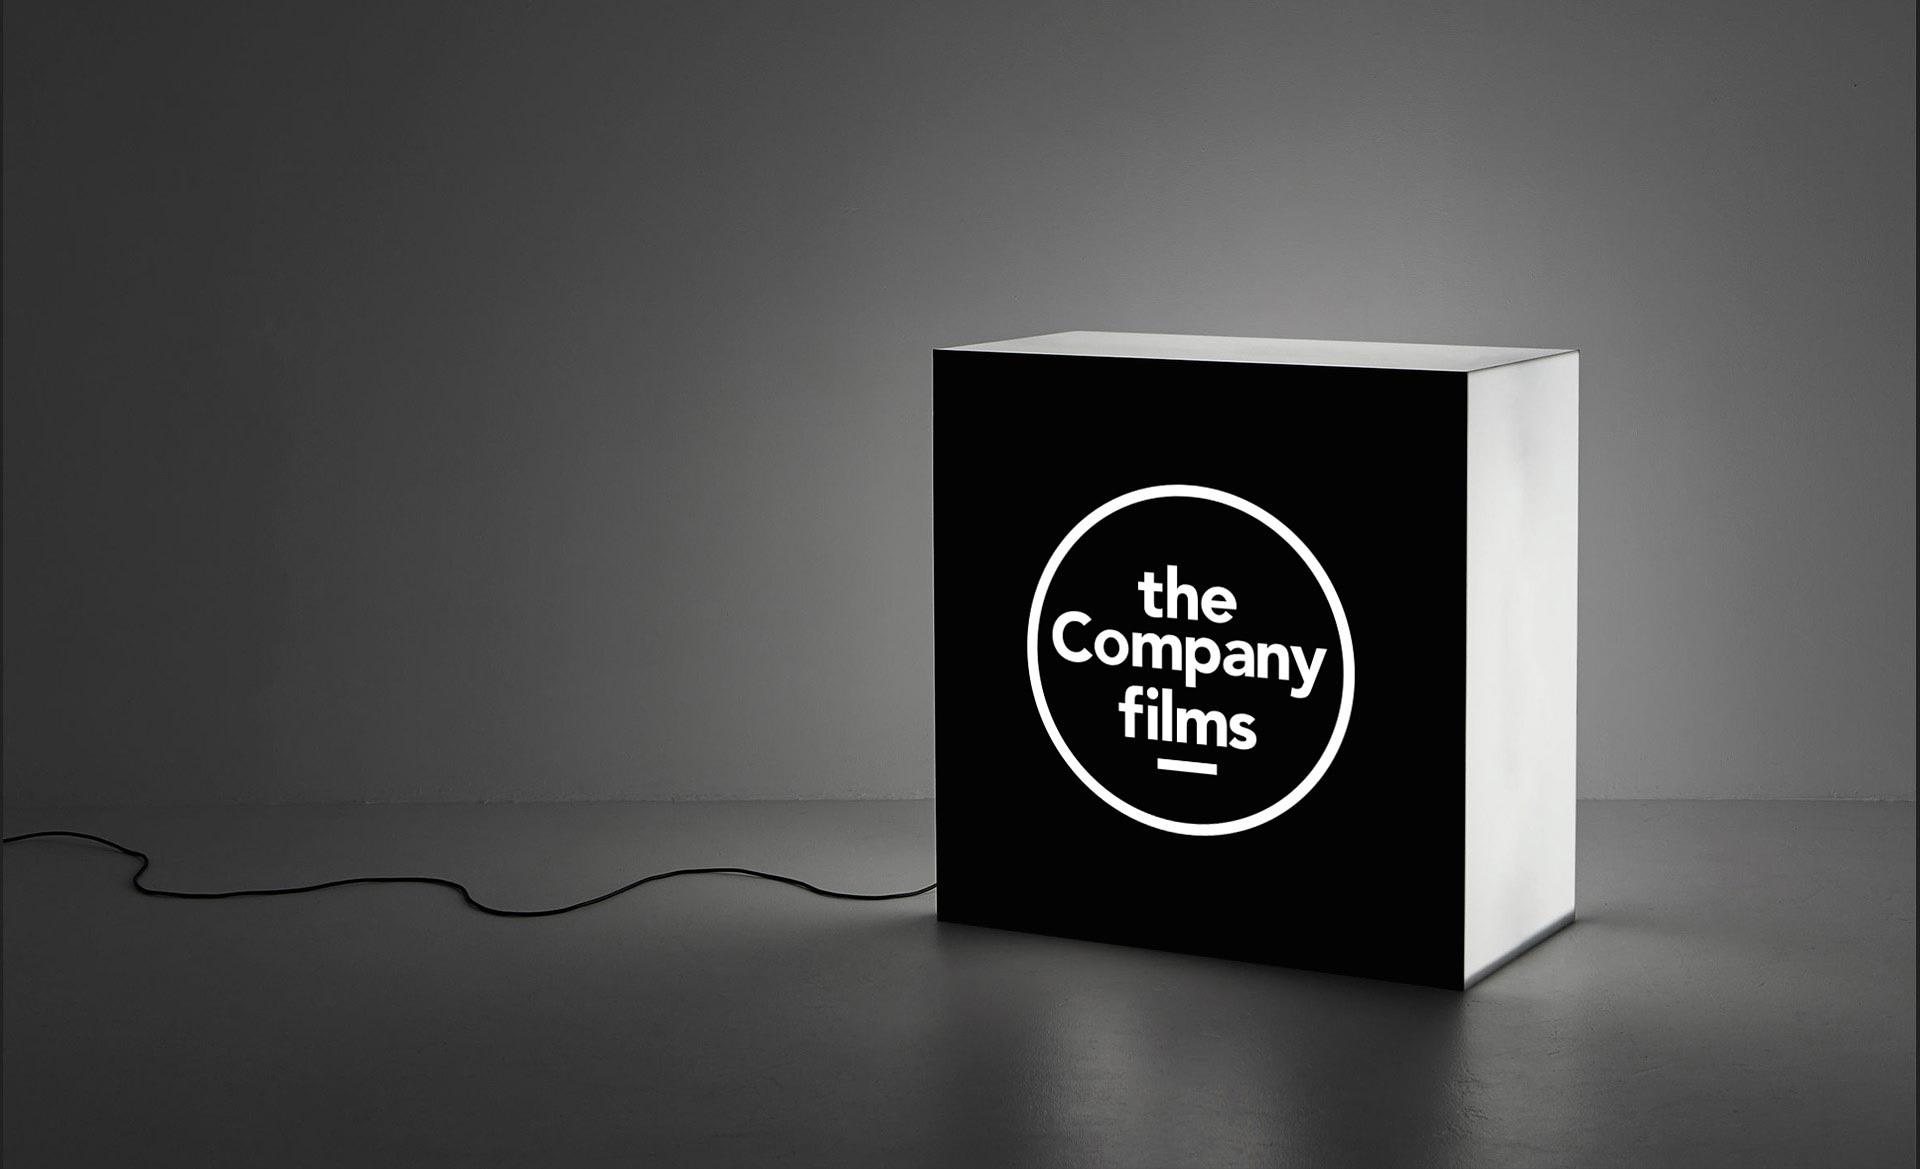 The Company Films